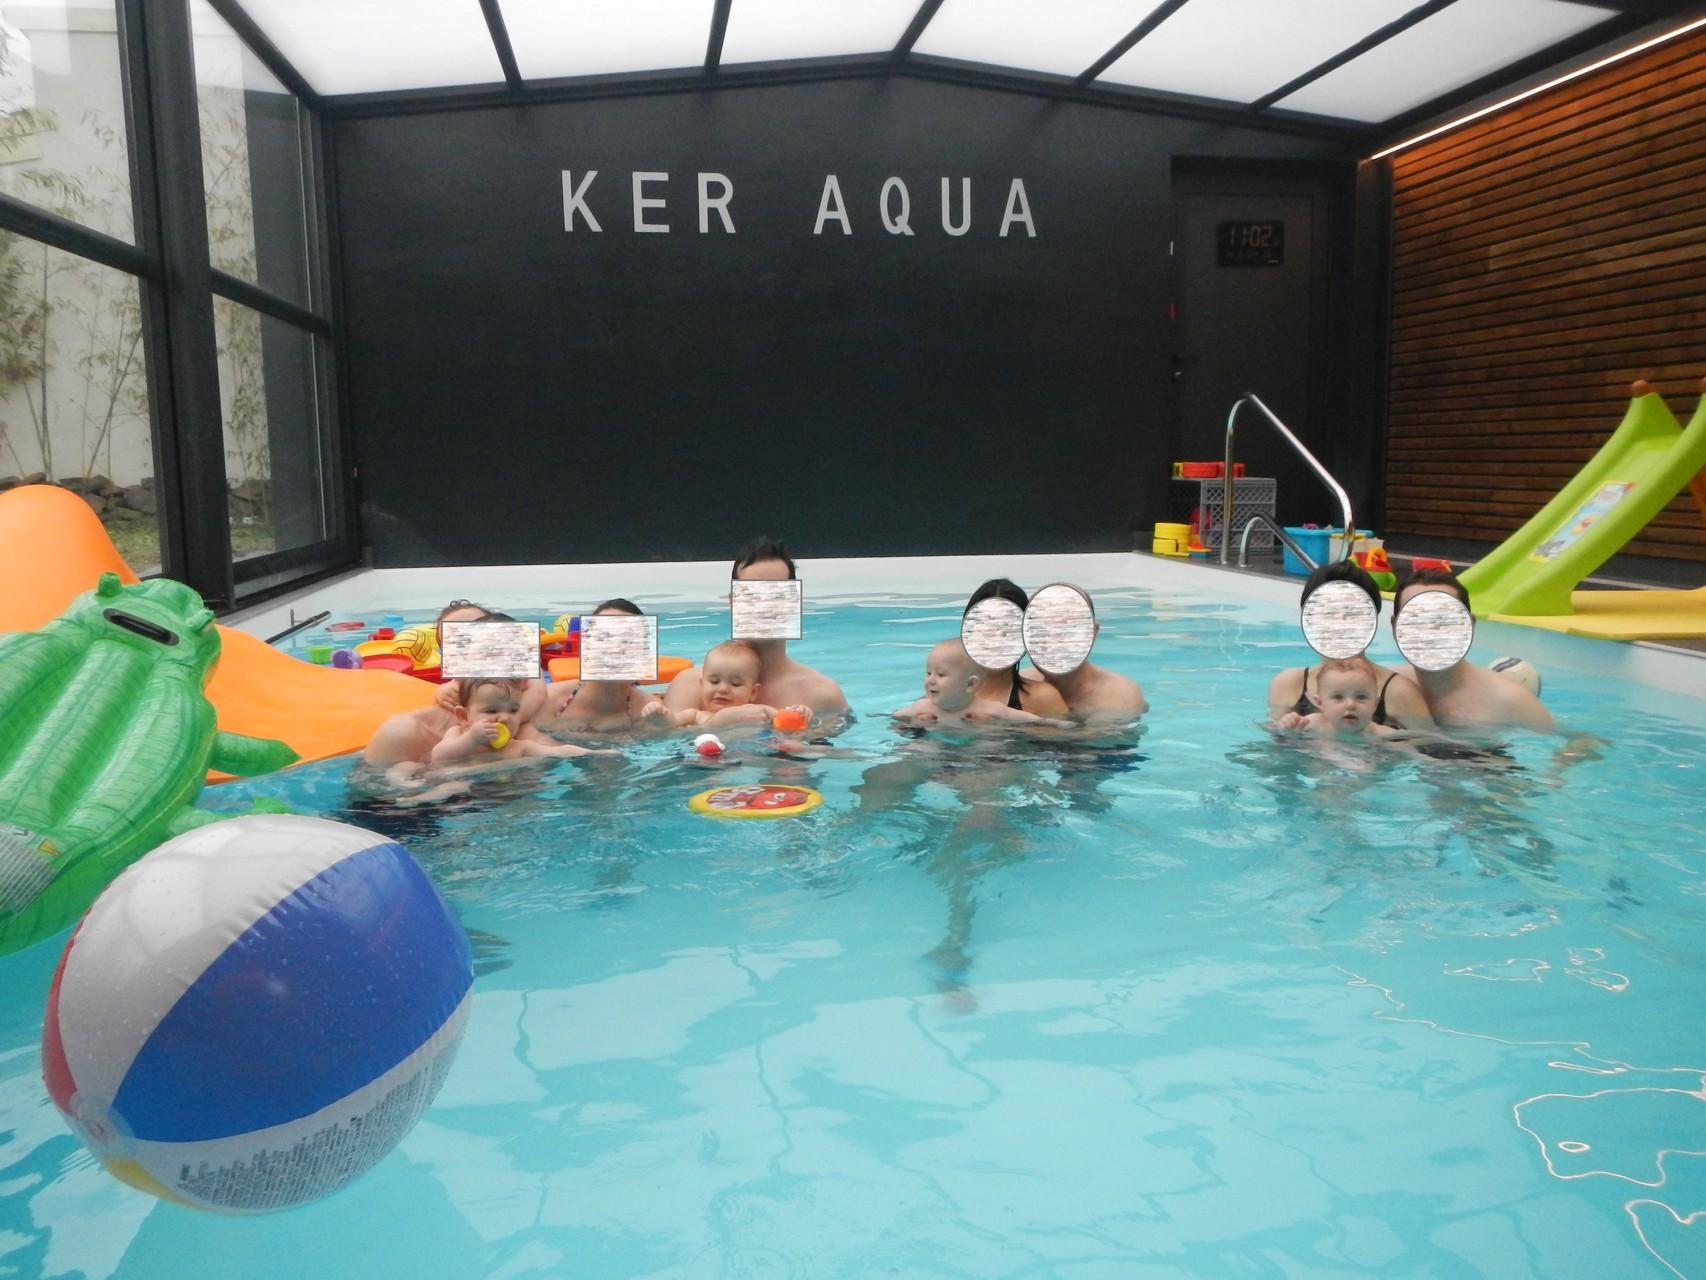 Actualit s ker aqua piscine priv e for Piscine privee rennes